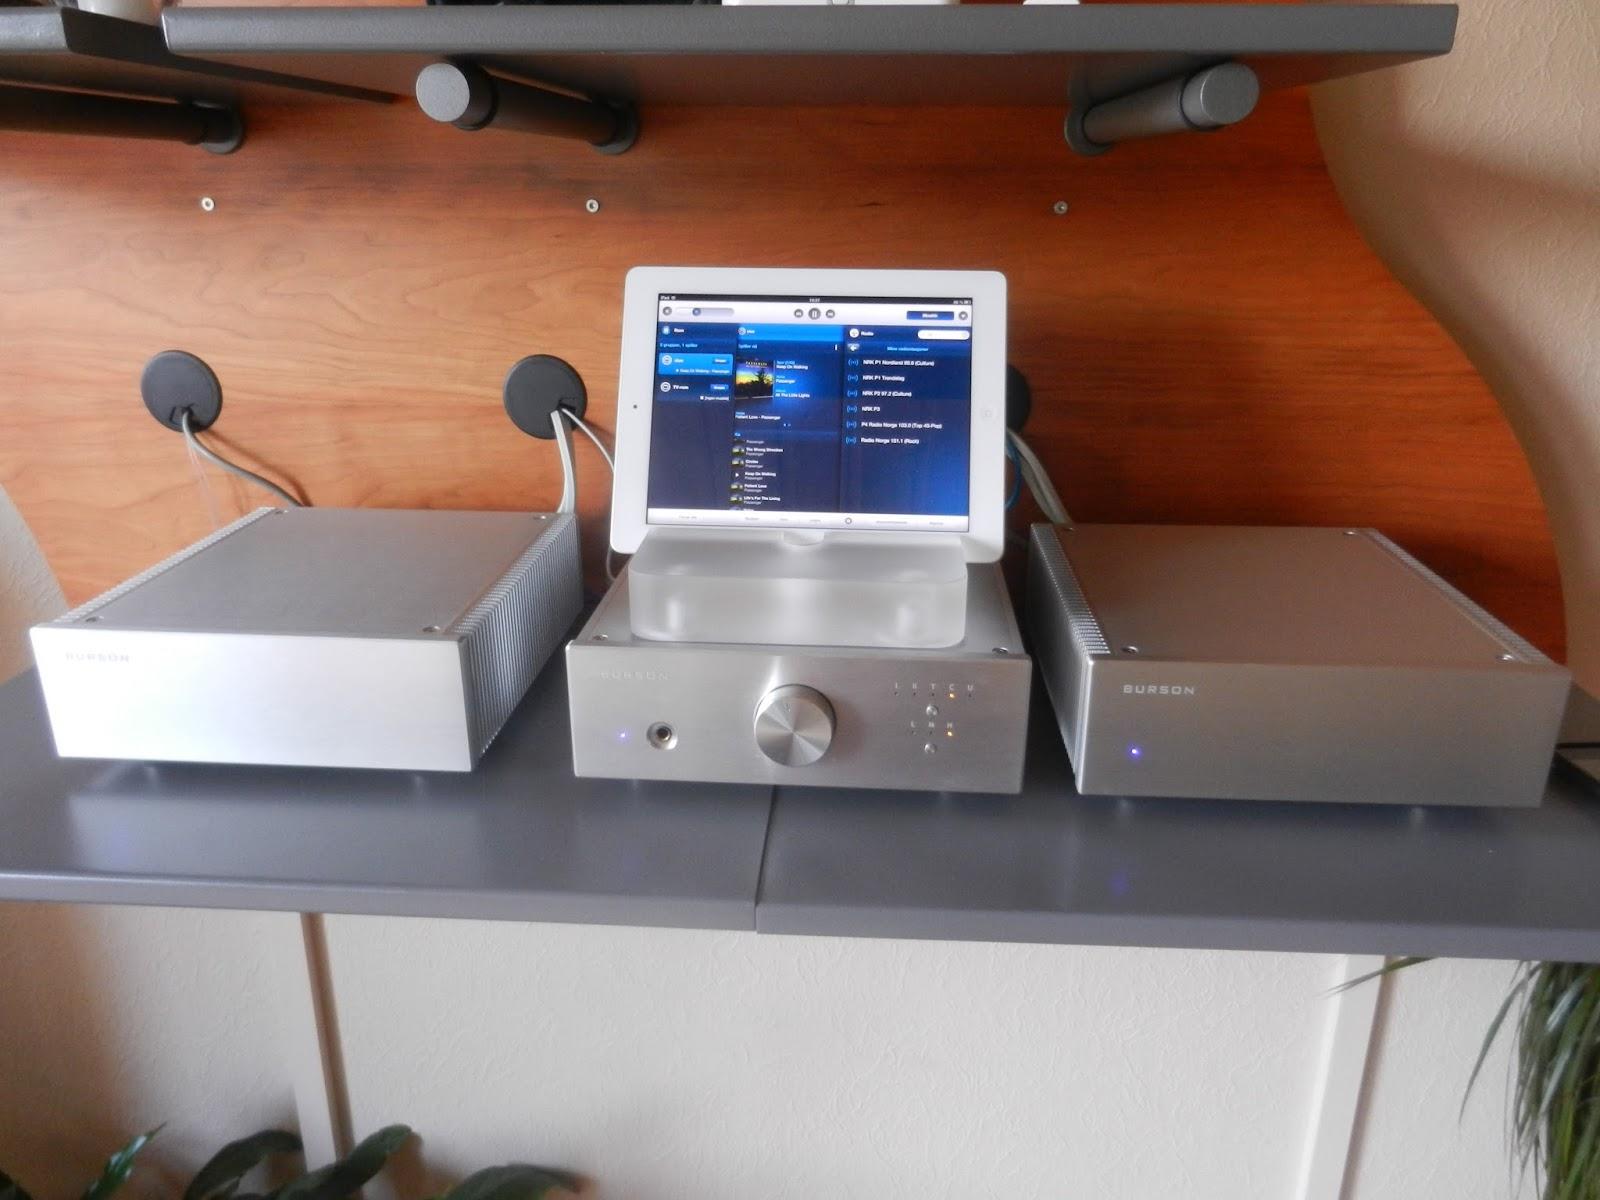 Power amplifier mono block preamp USB DAC